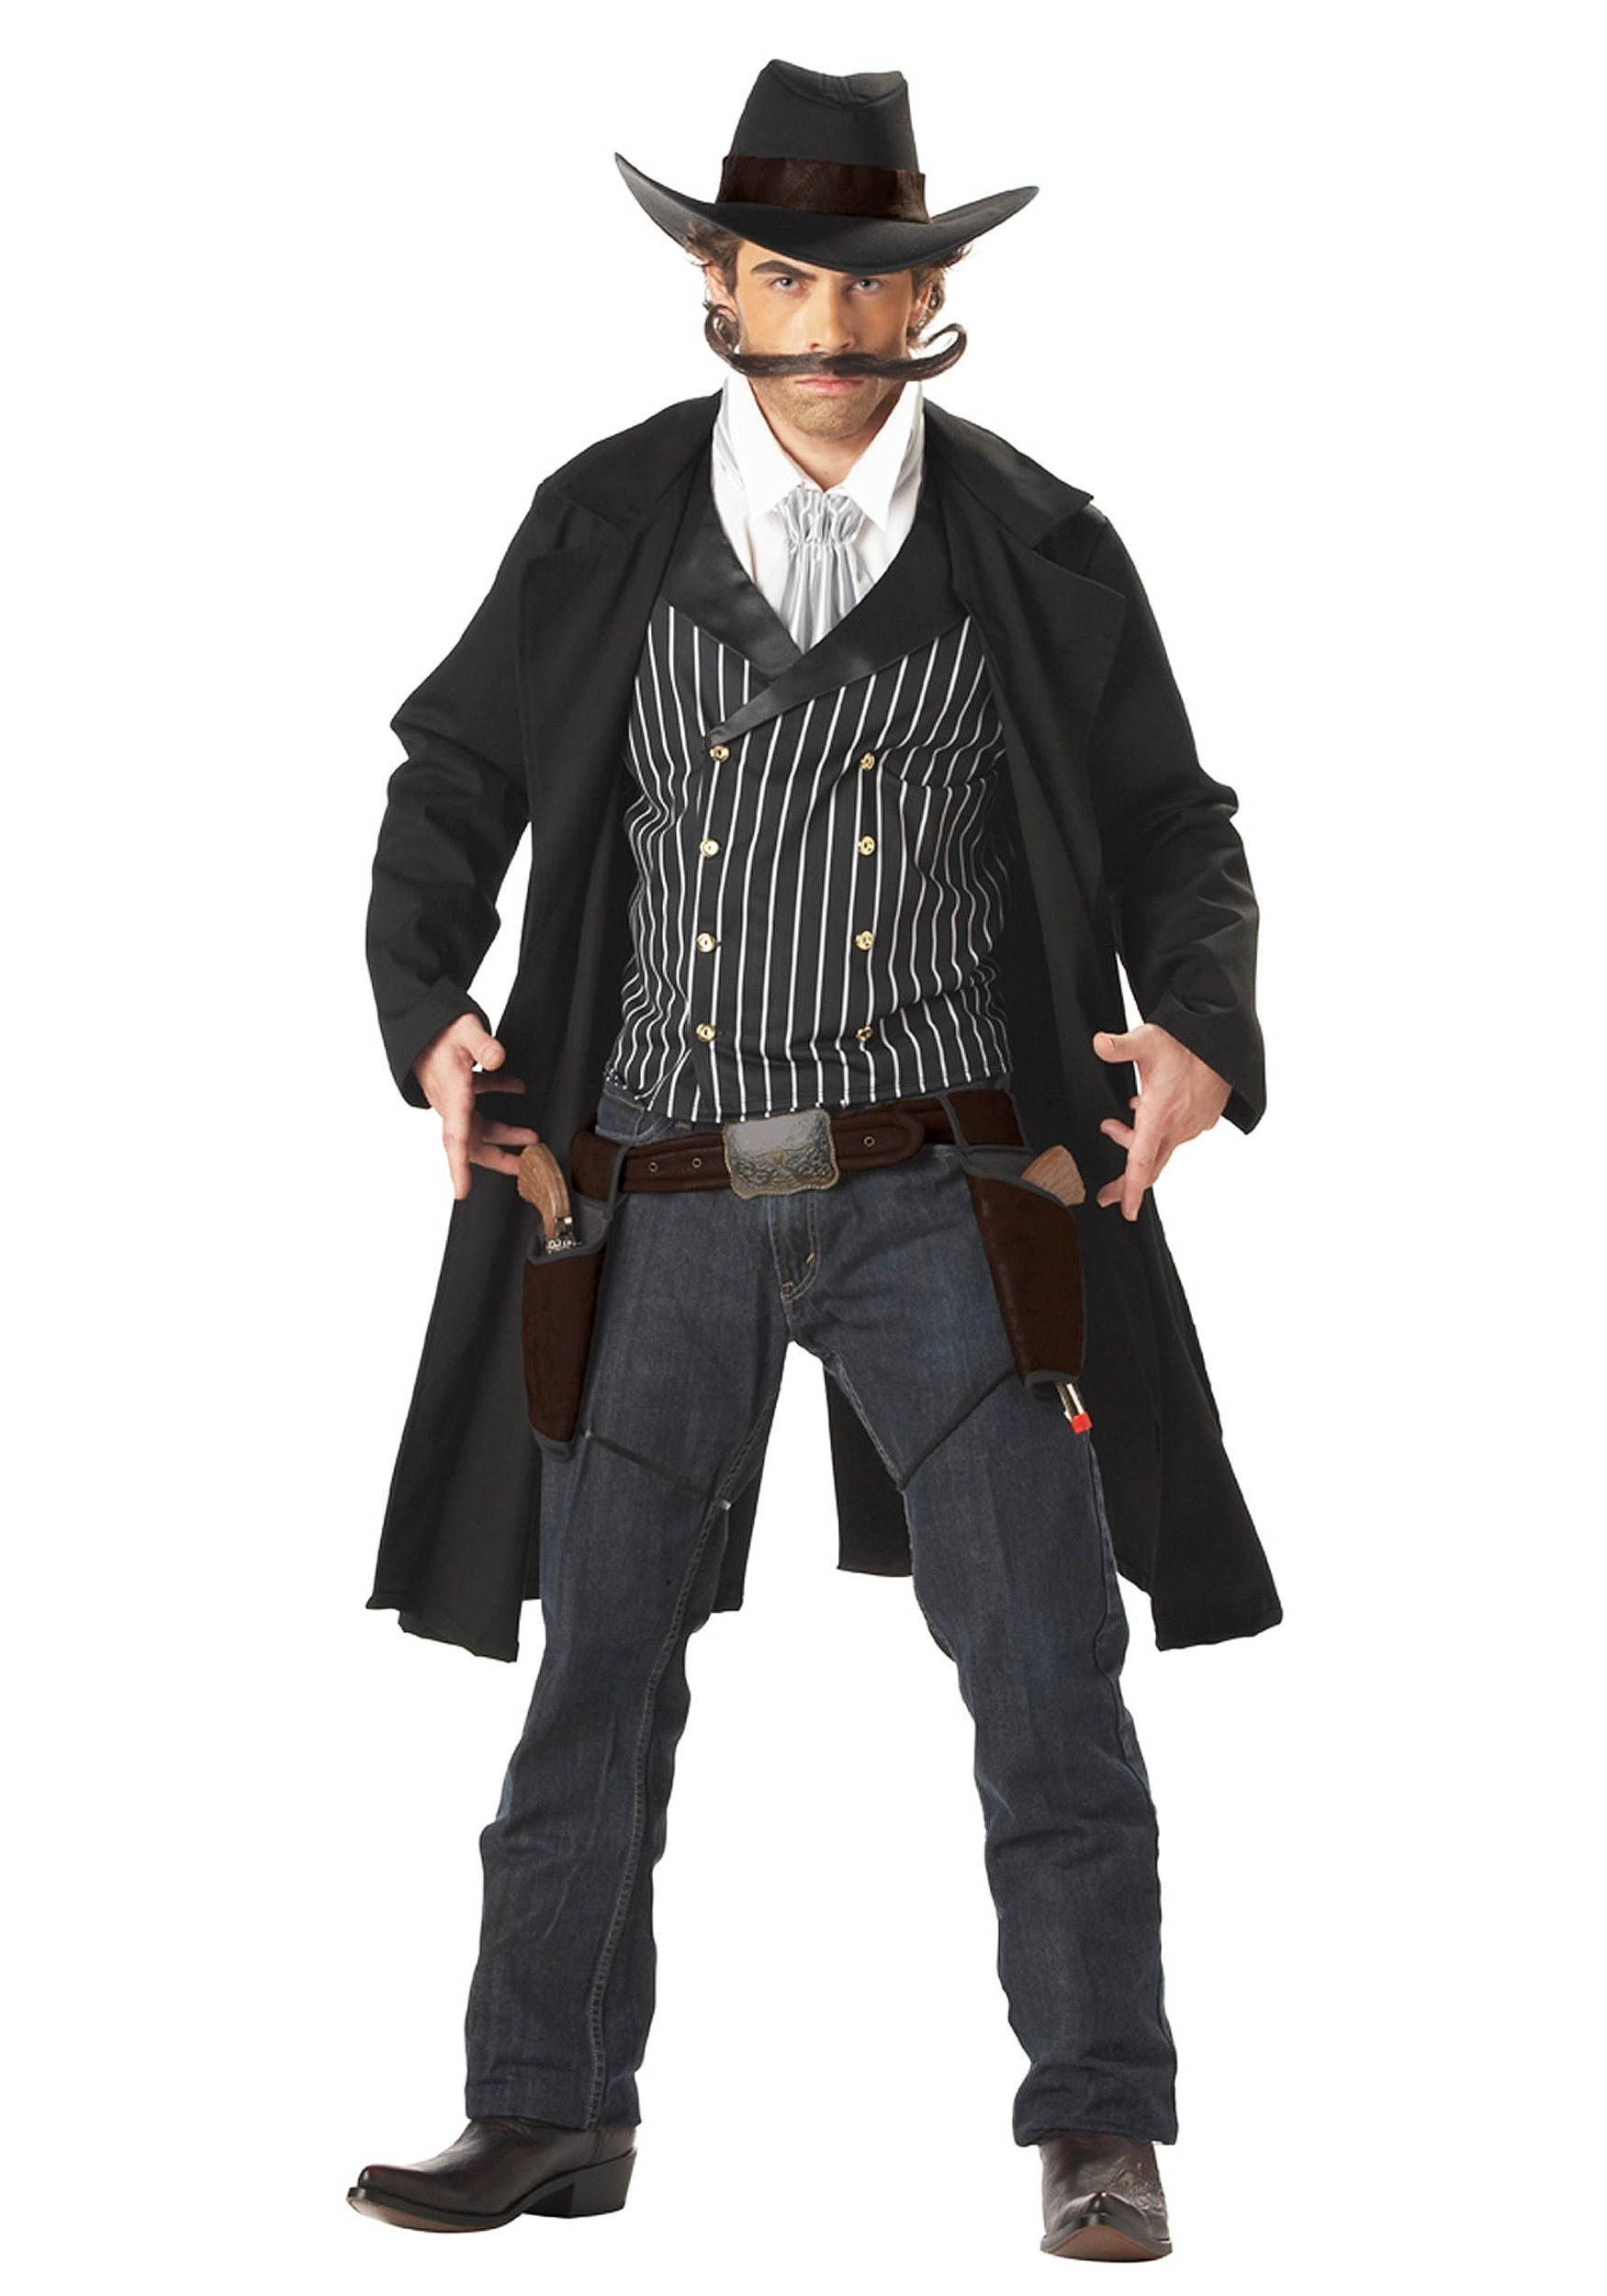 Cowboy Costume Adult Duster Coat Halloween Fancy Dress